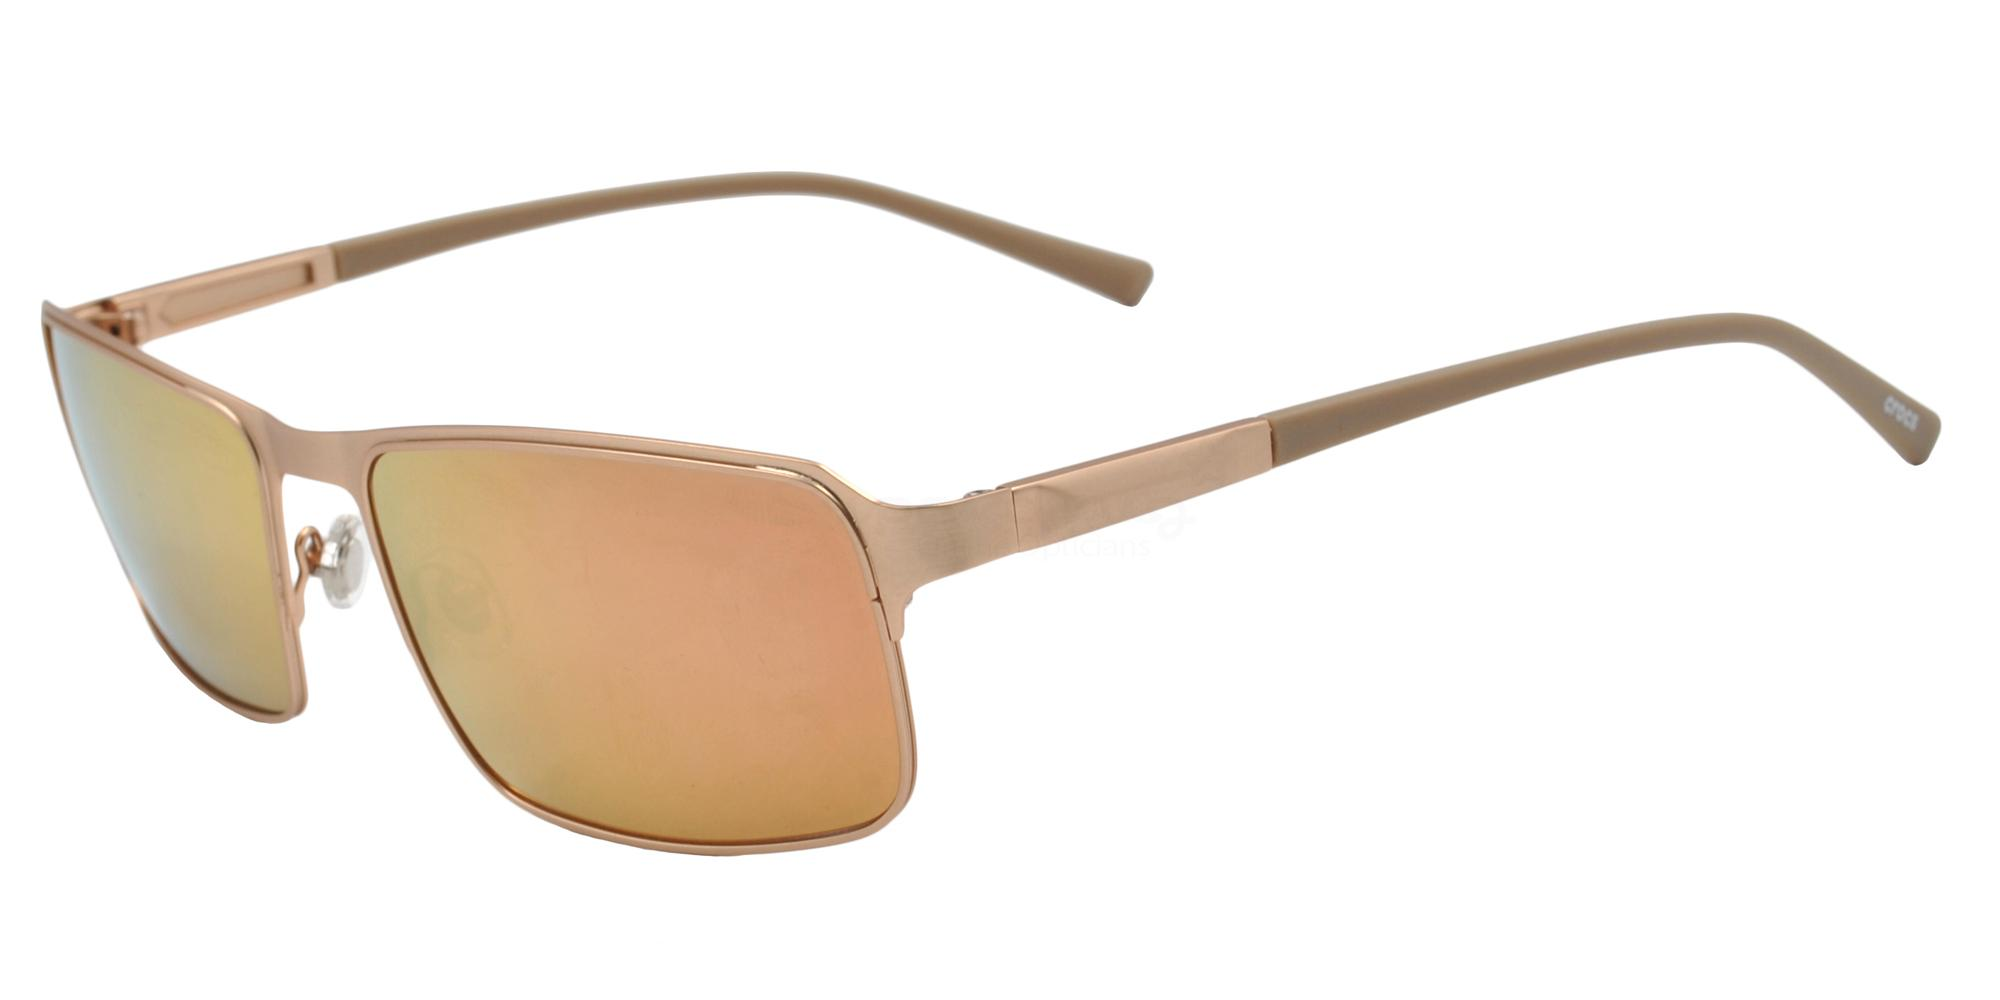 33BN CS043 Sunglasses, Crocs Eyewear